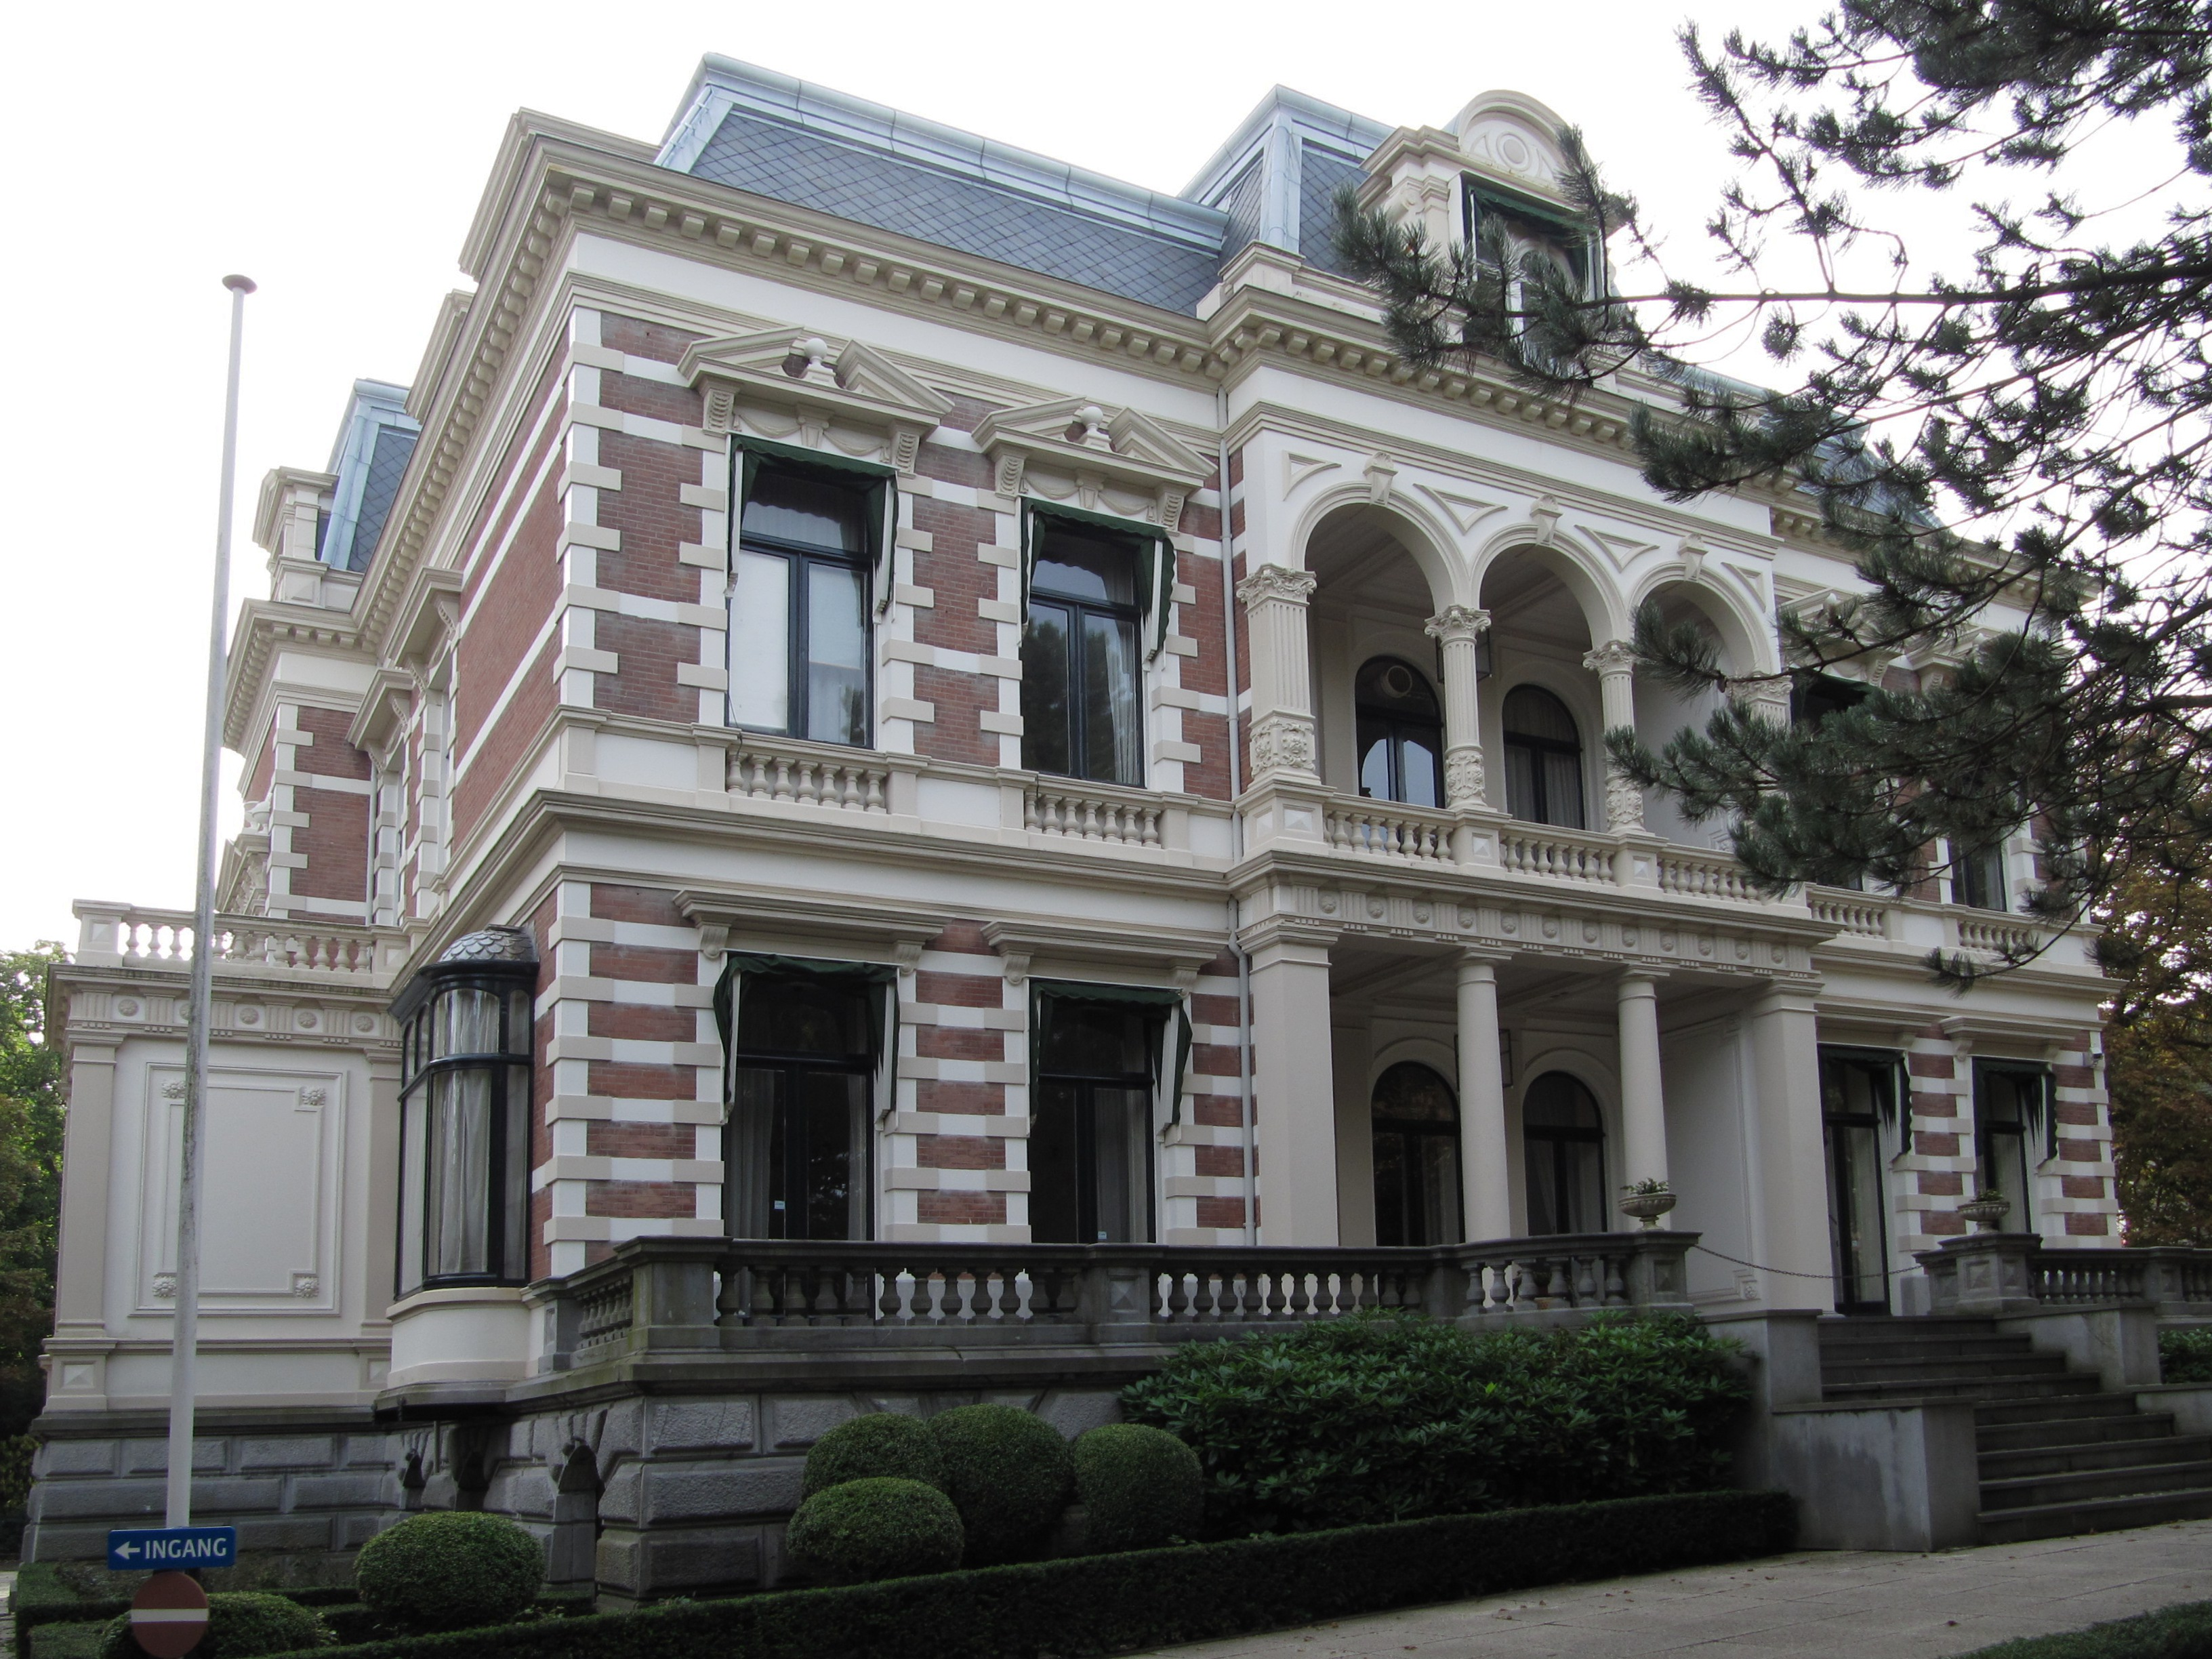 Villa Olanda In S Gravenhage Monument Rijksmonumenten Nl